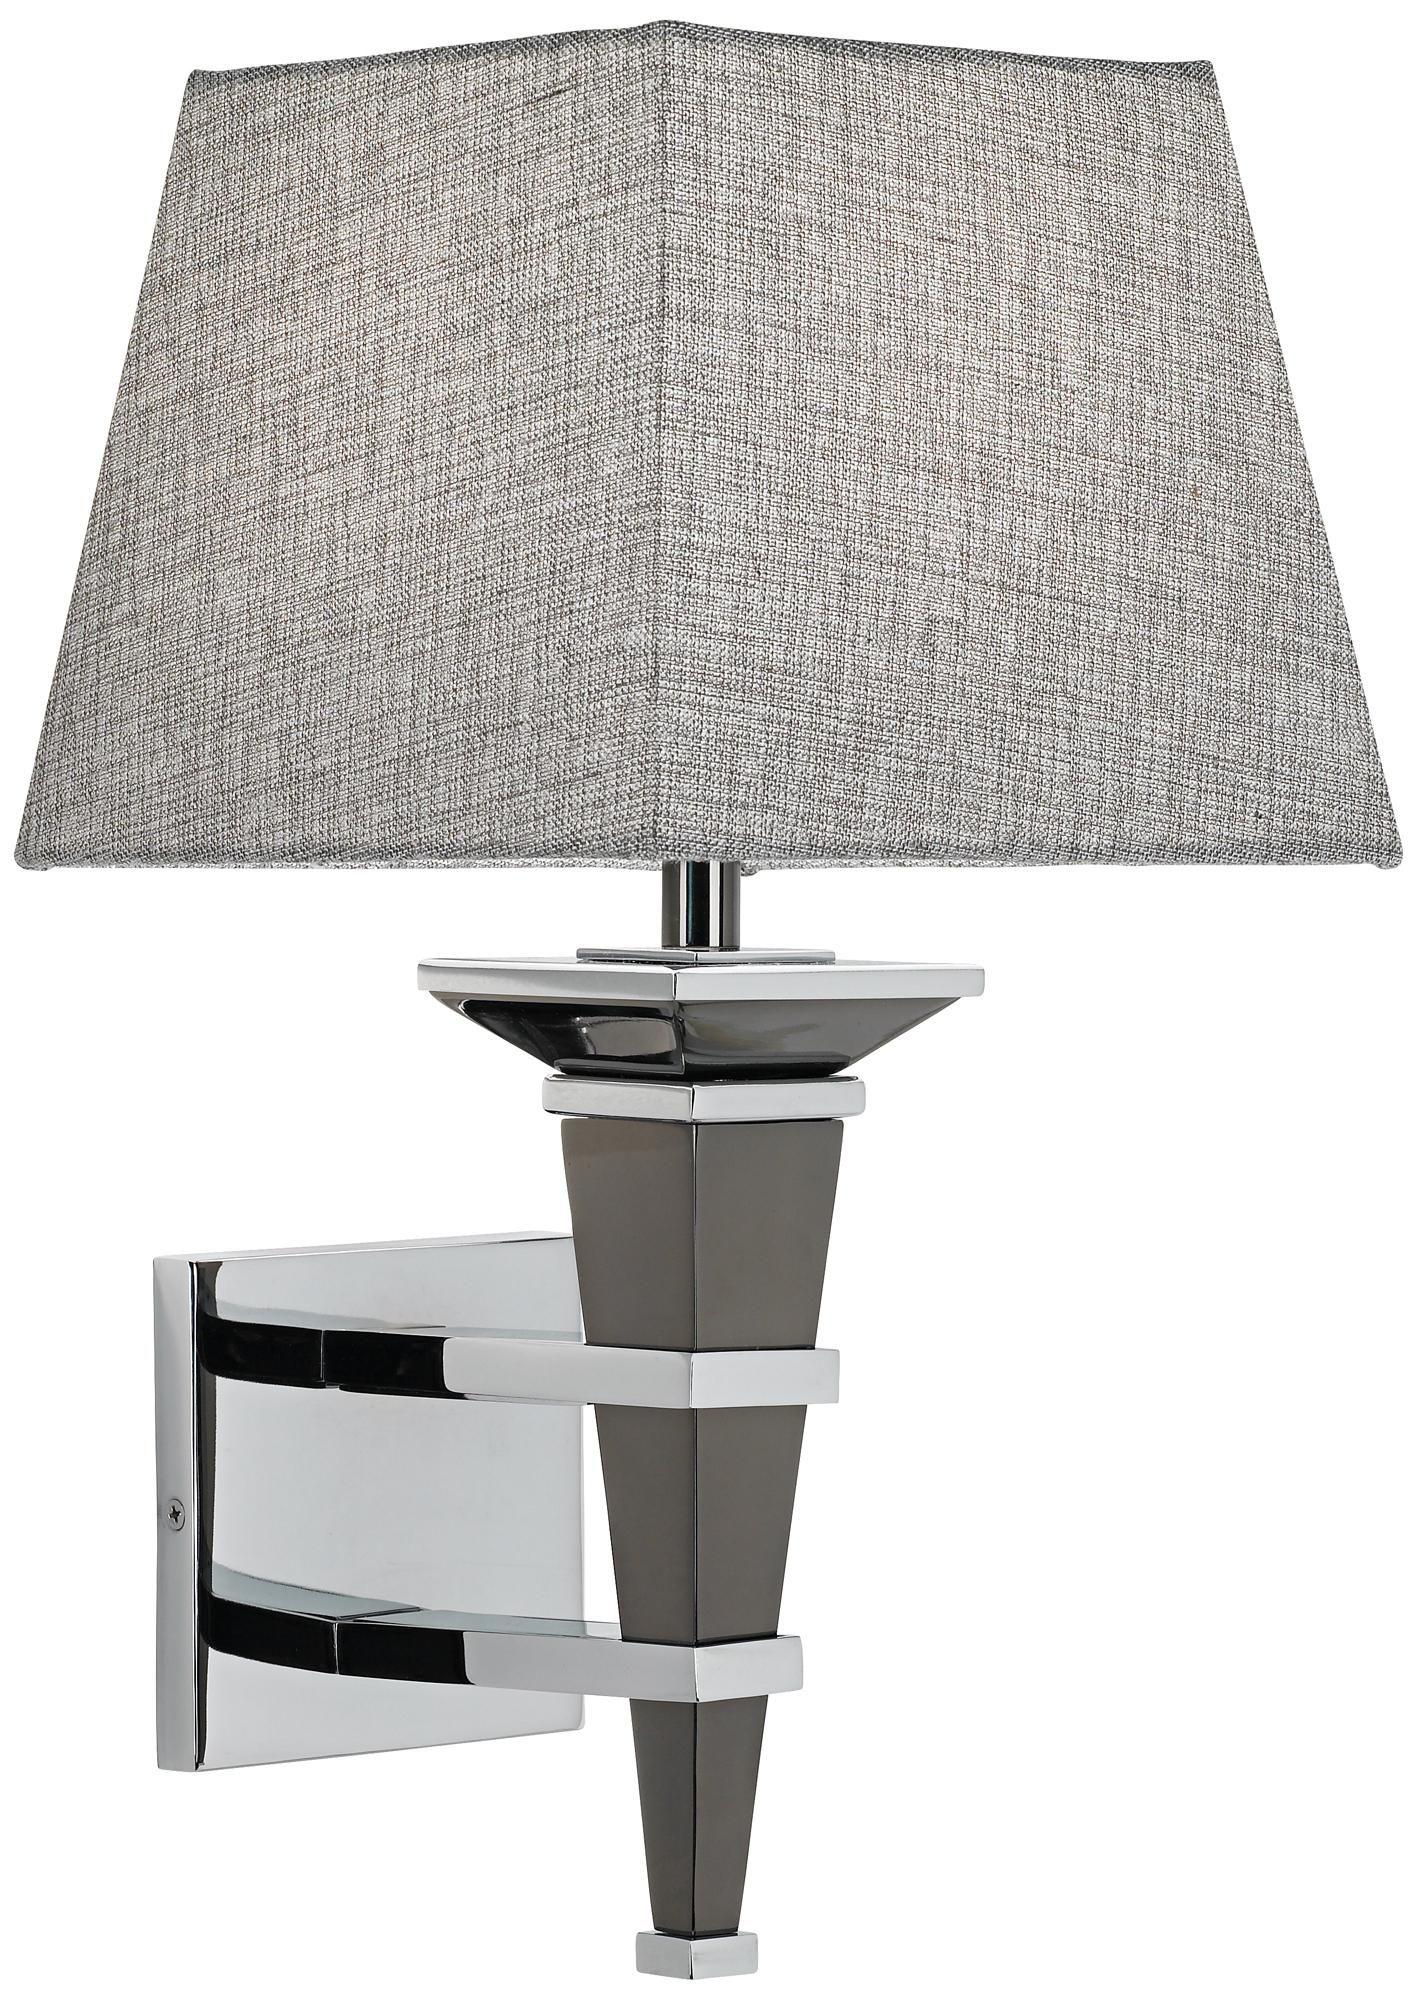 "Bathroom Light Fixtures With Fabric Shades textured fabric shade 18 1/2"" high chrome wall sconce - | bathroom"